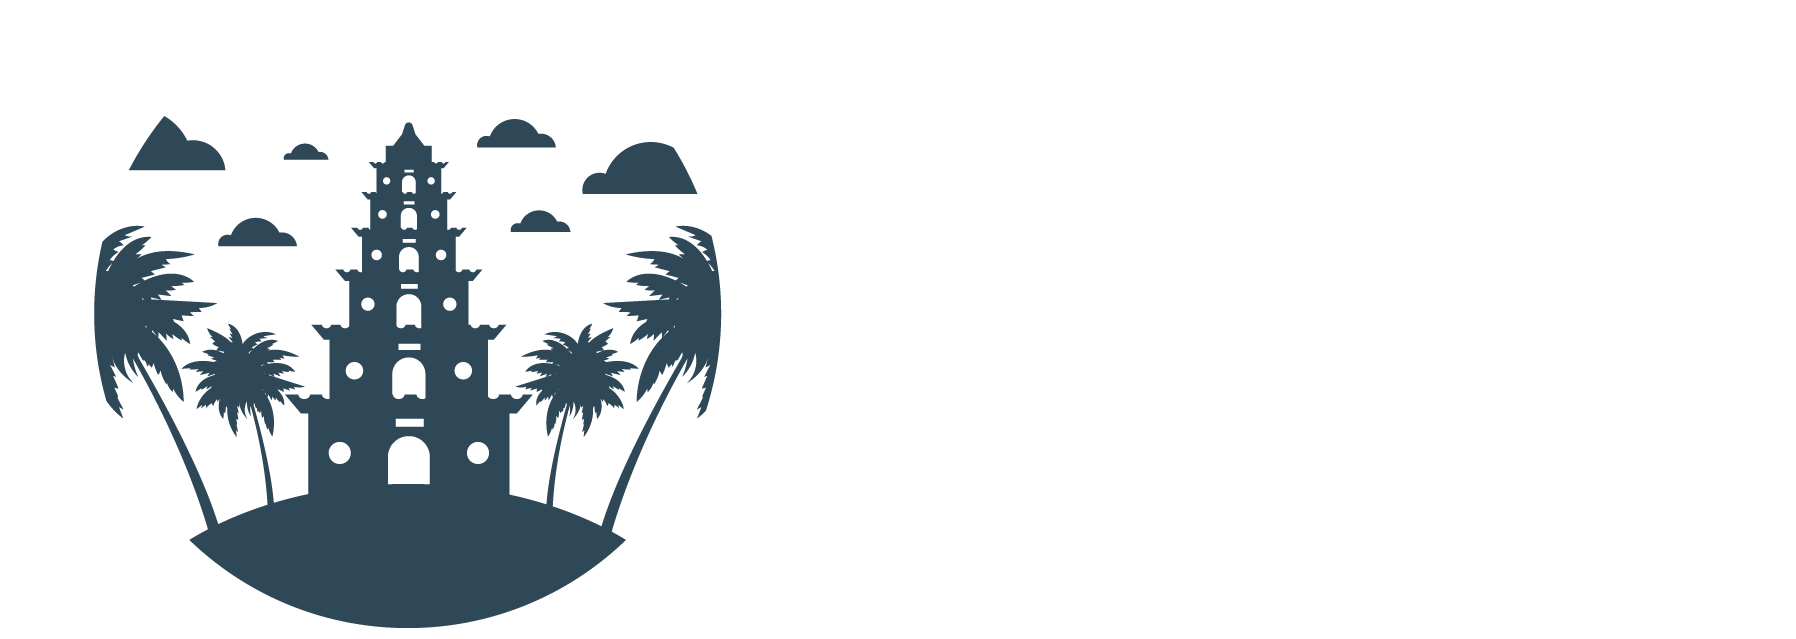 Viajar por Vietnam